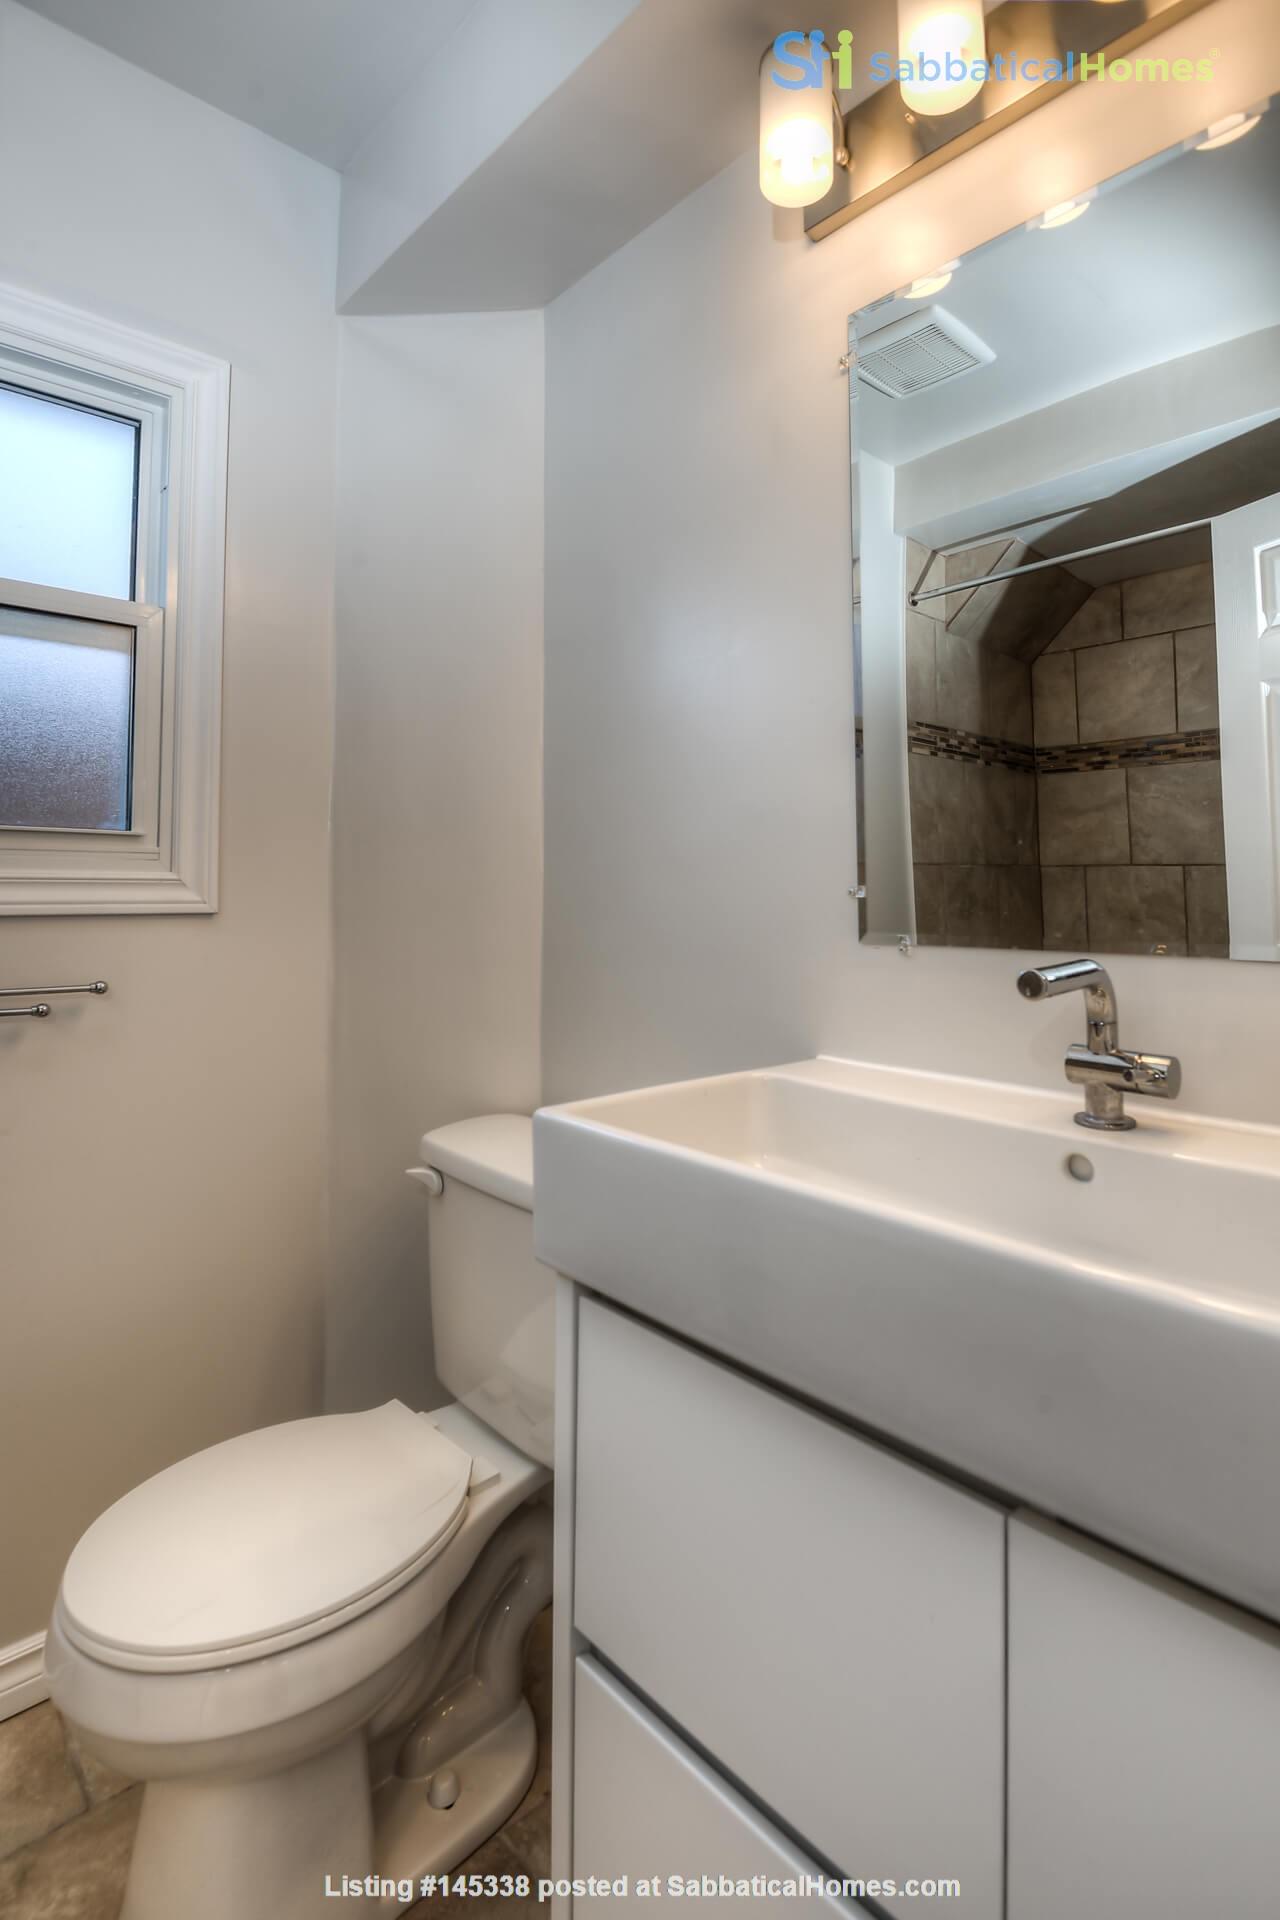 3 bdrm home (unfurnished) - downtown Kitchener-Waterloo Home Rental in Kitchener, Ontario, Canada 8